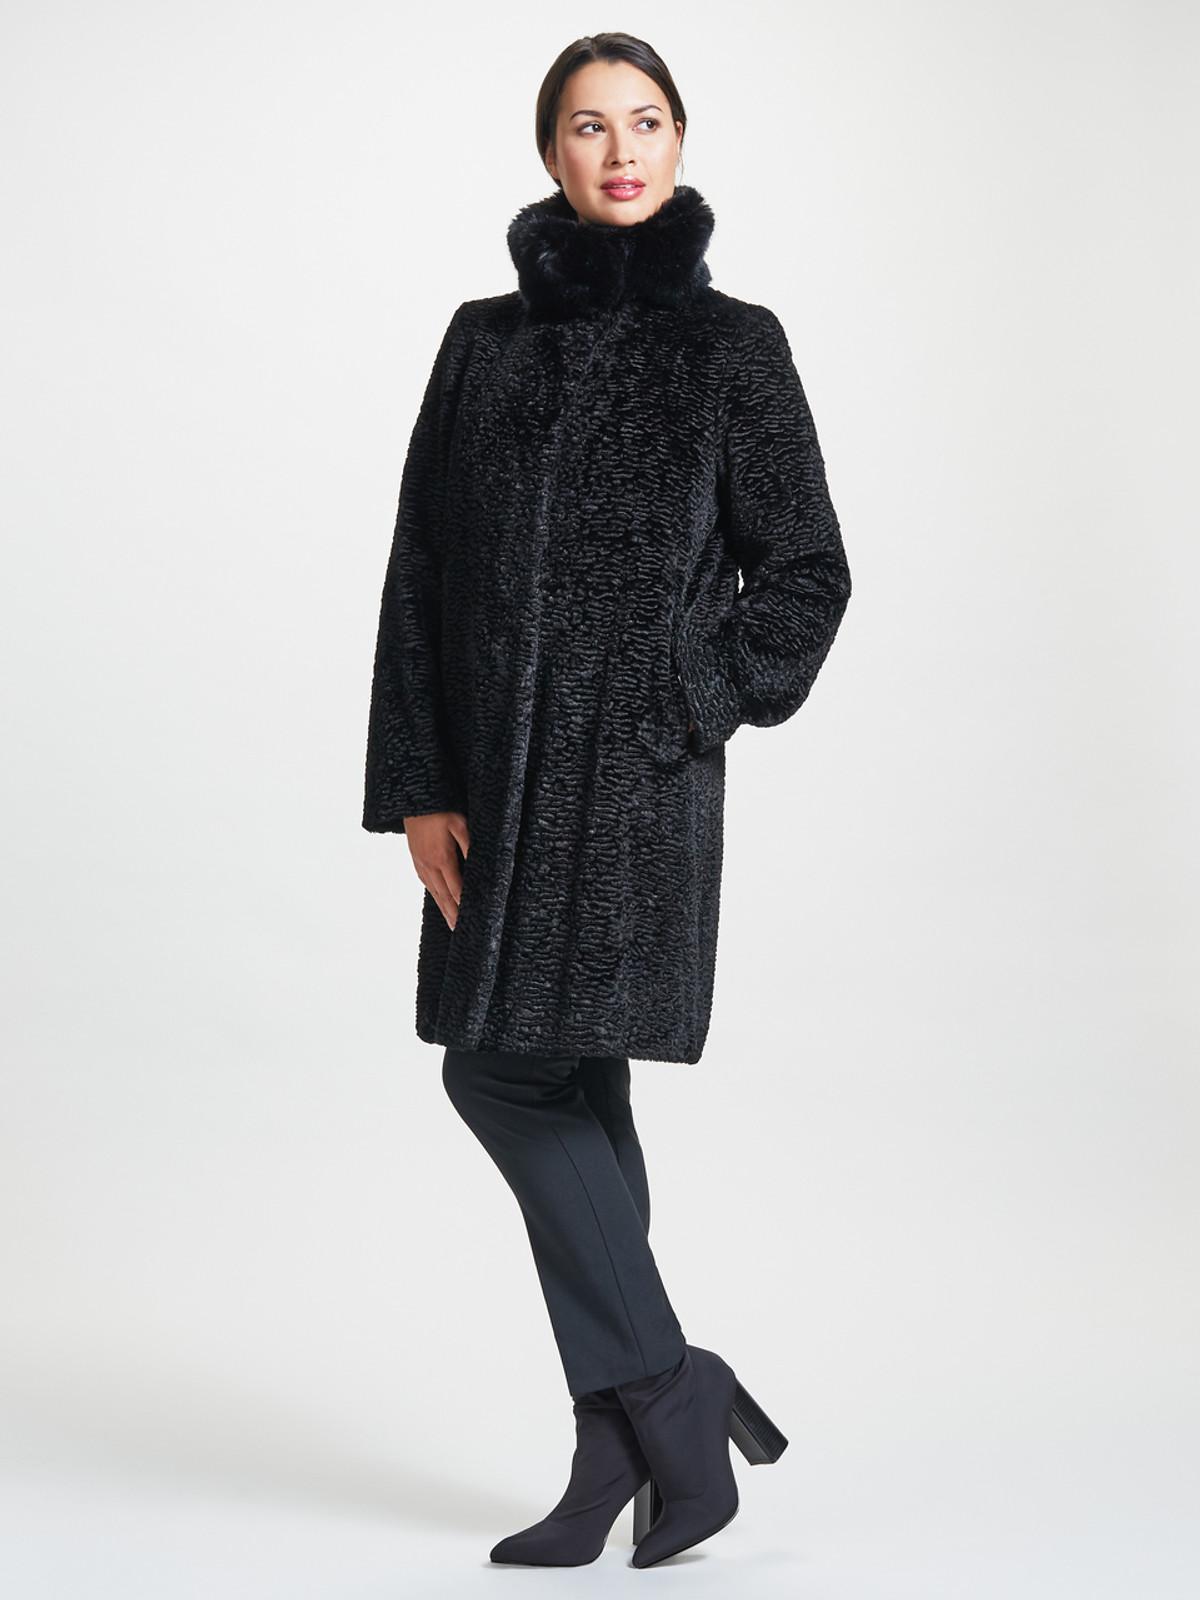 Astrakan Coat with Fur Collar, Black